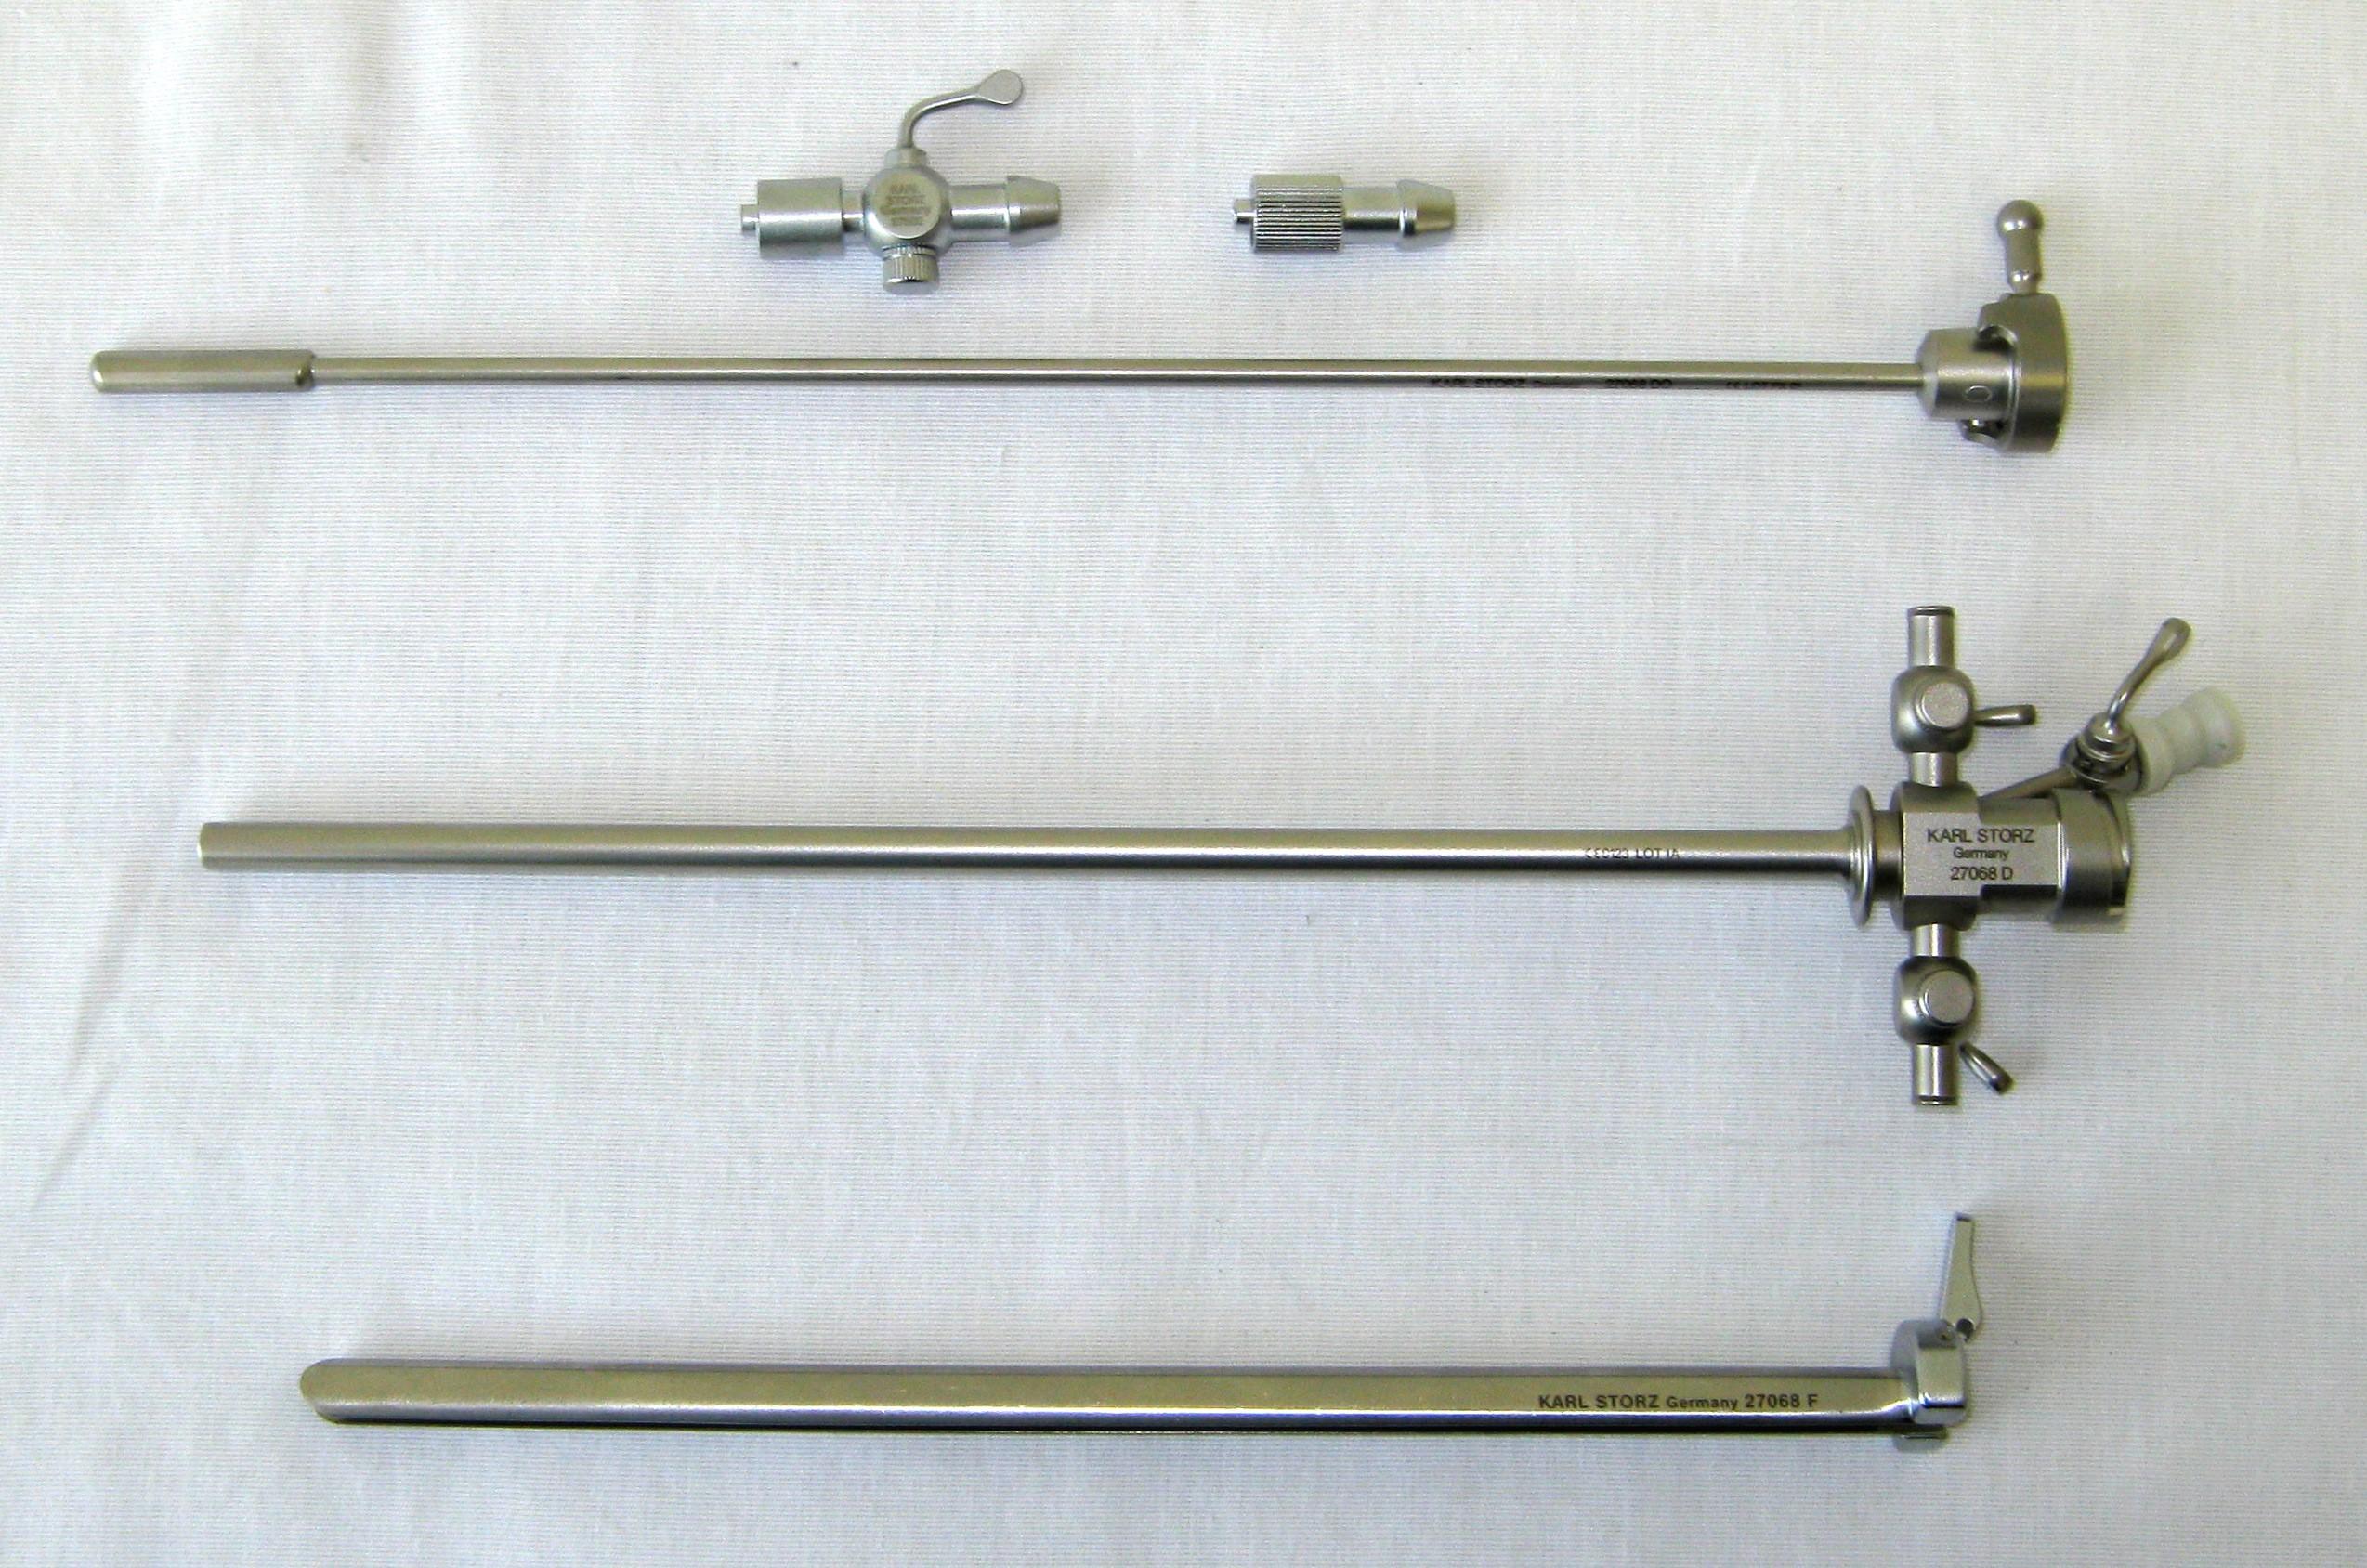 Storz 27068 D Sachse Urethrotome Sheath Set, 21 Fr